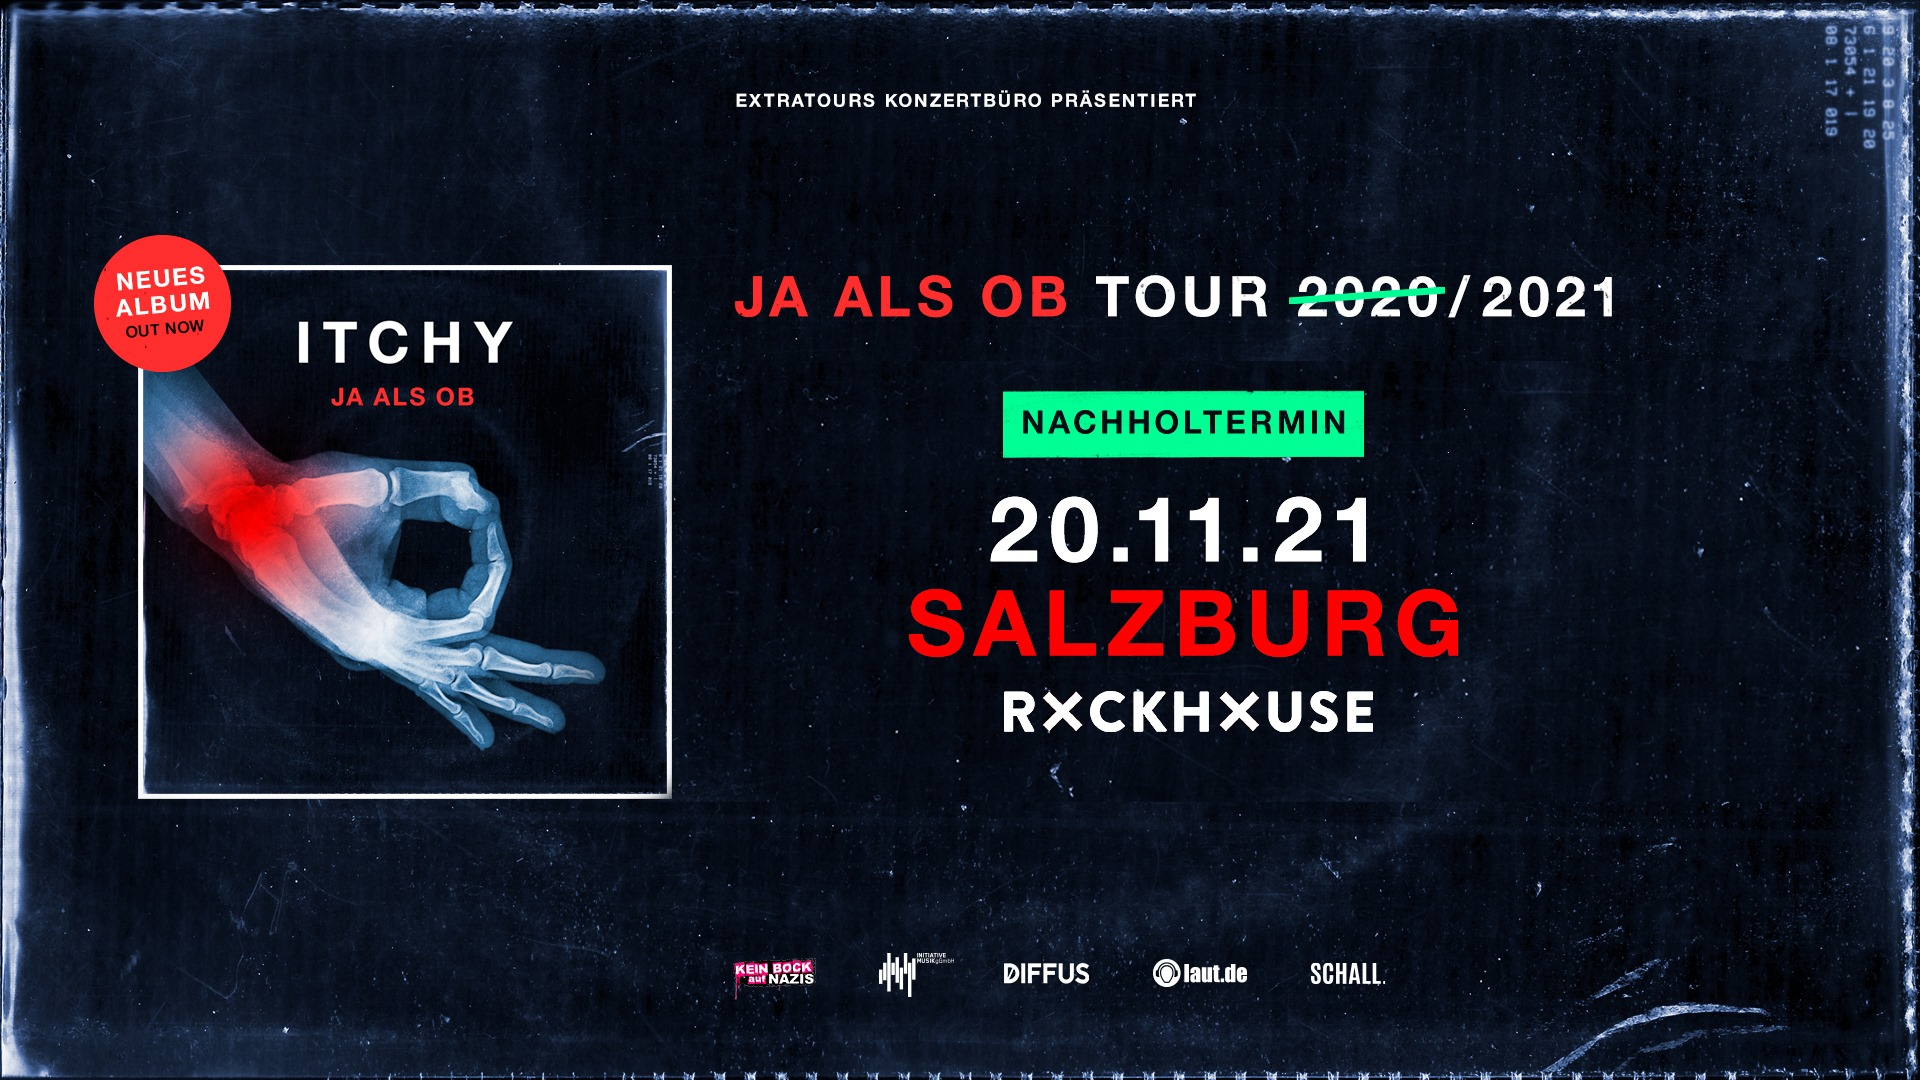 Itchy am 18. December 2020 @ Rockhouse Salzburg.